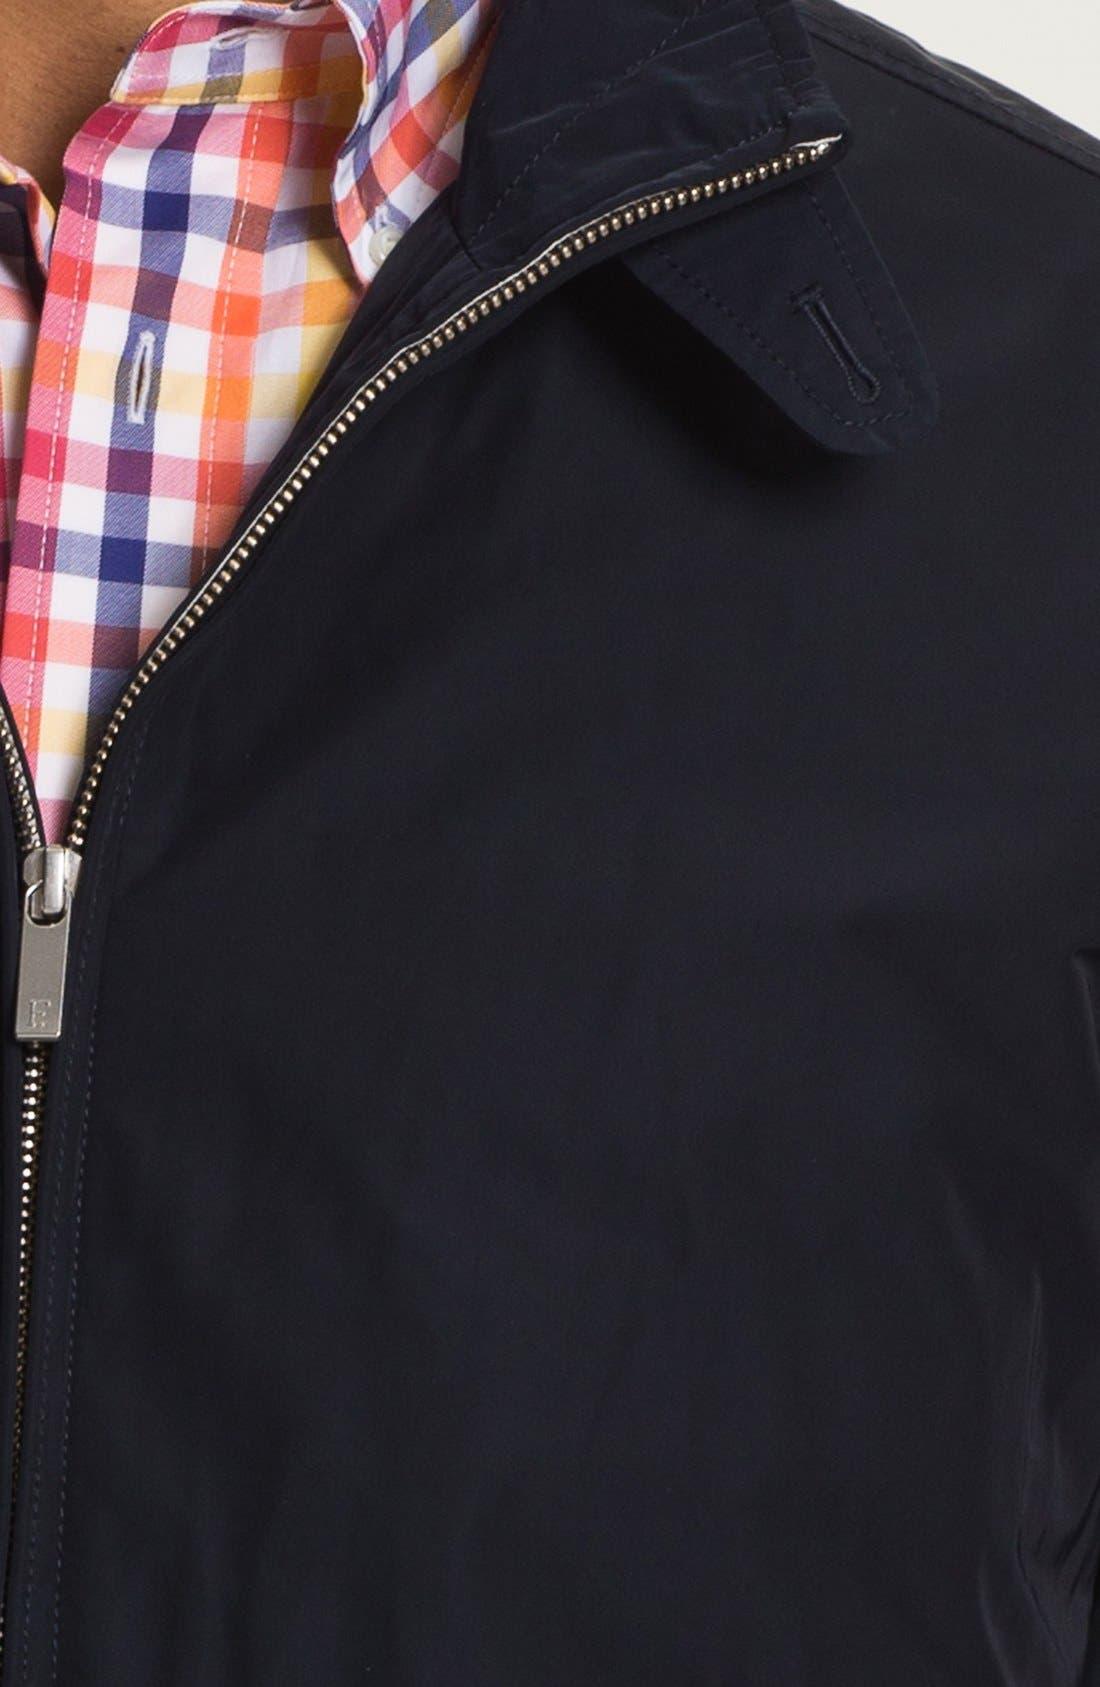 Alternate Image 3  - Façonnable Open Bottom Jacket (Big & Tall)